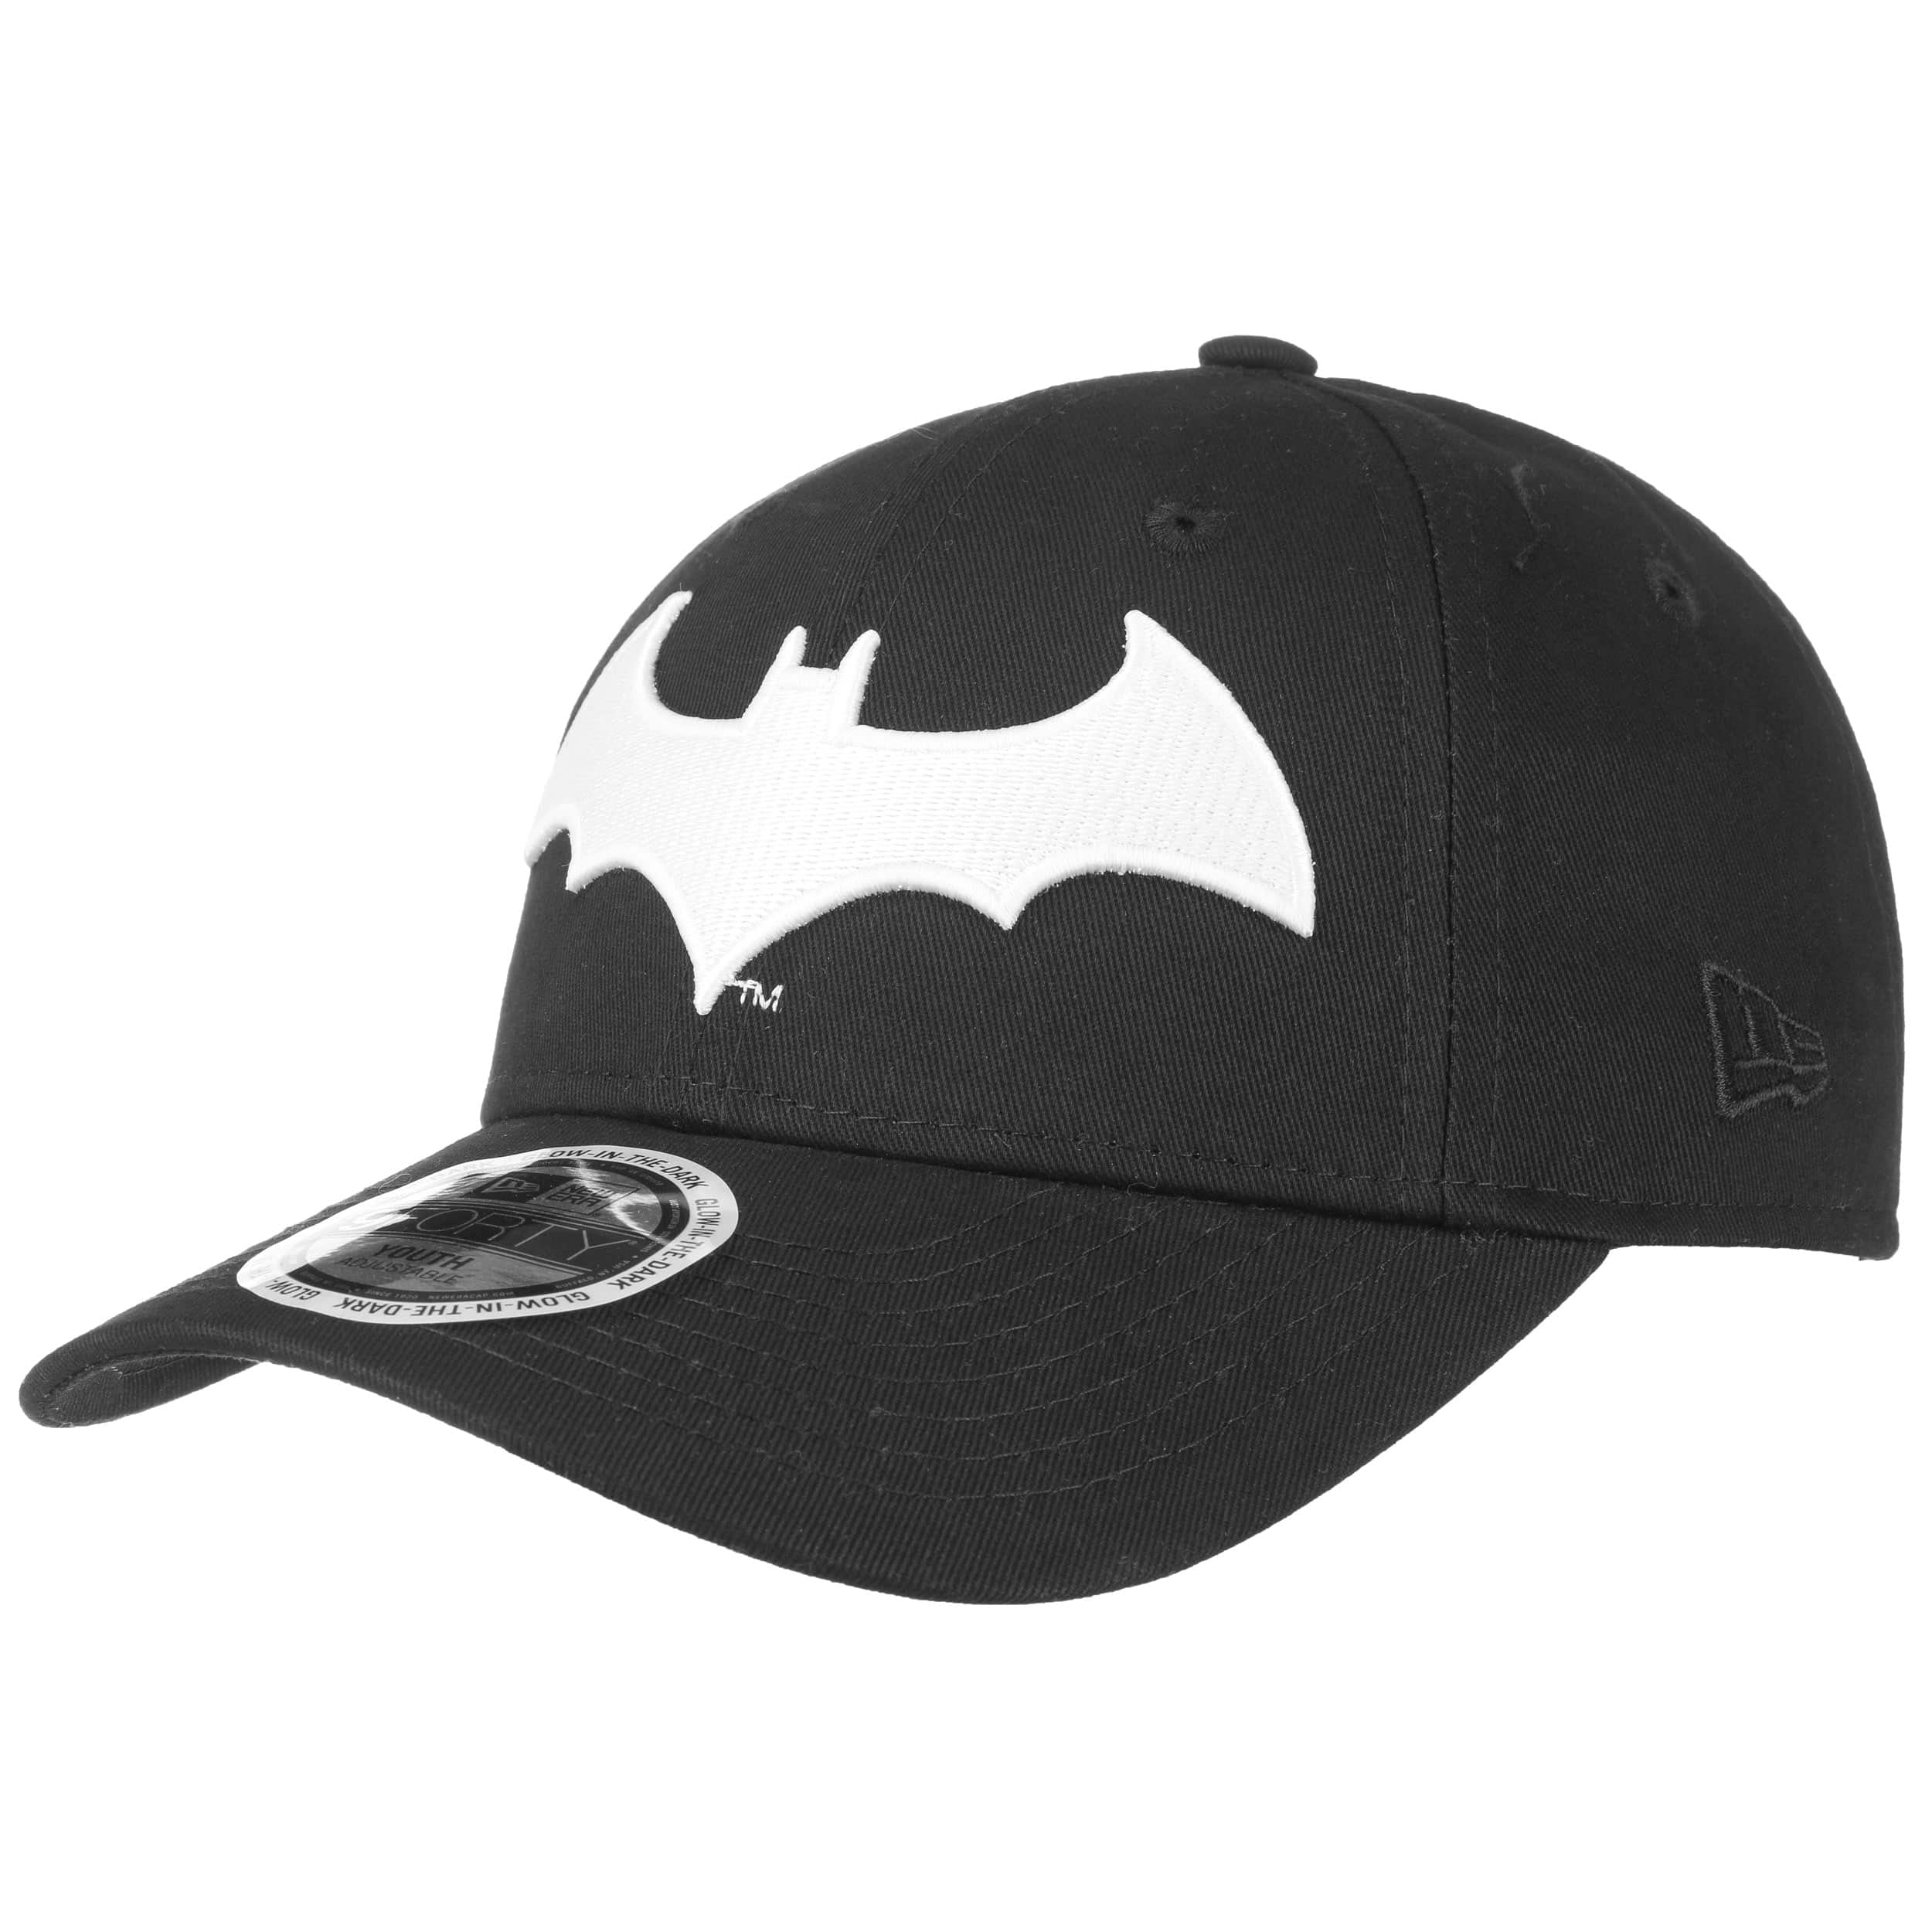 2ac2b24c75c ... 9Forty Junior GITD Batman Cap by New Era - black 6